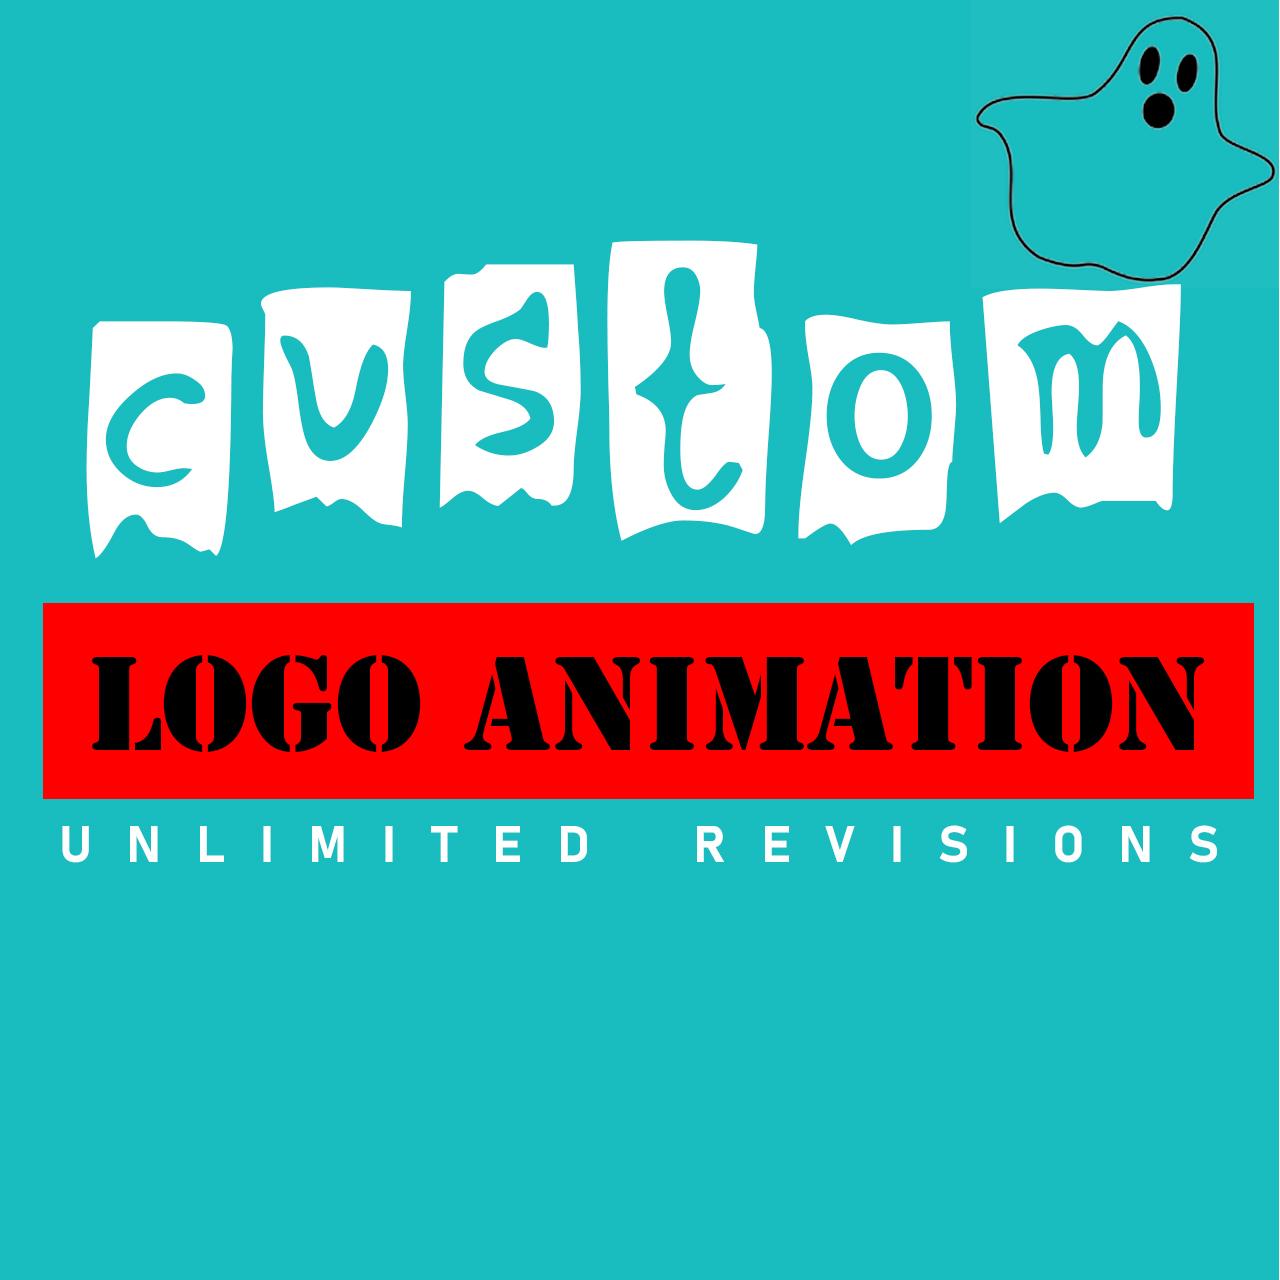 custom logo animation, intro and outro